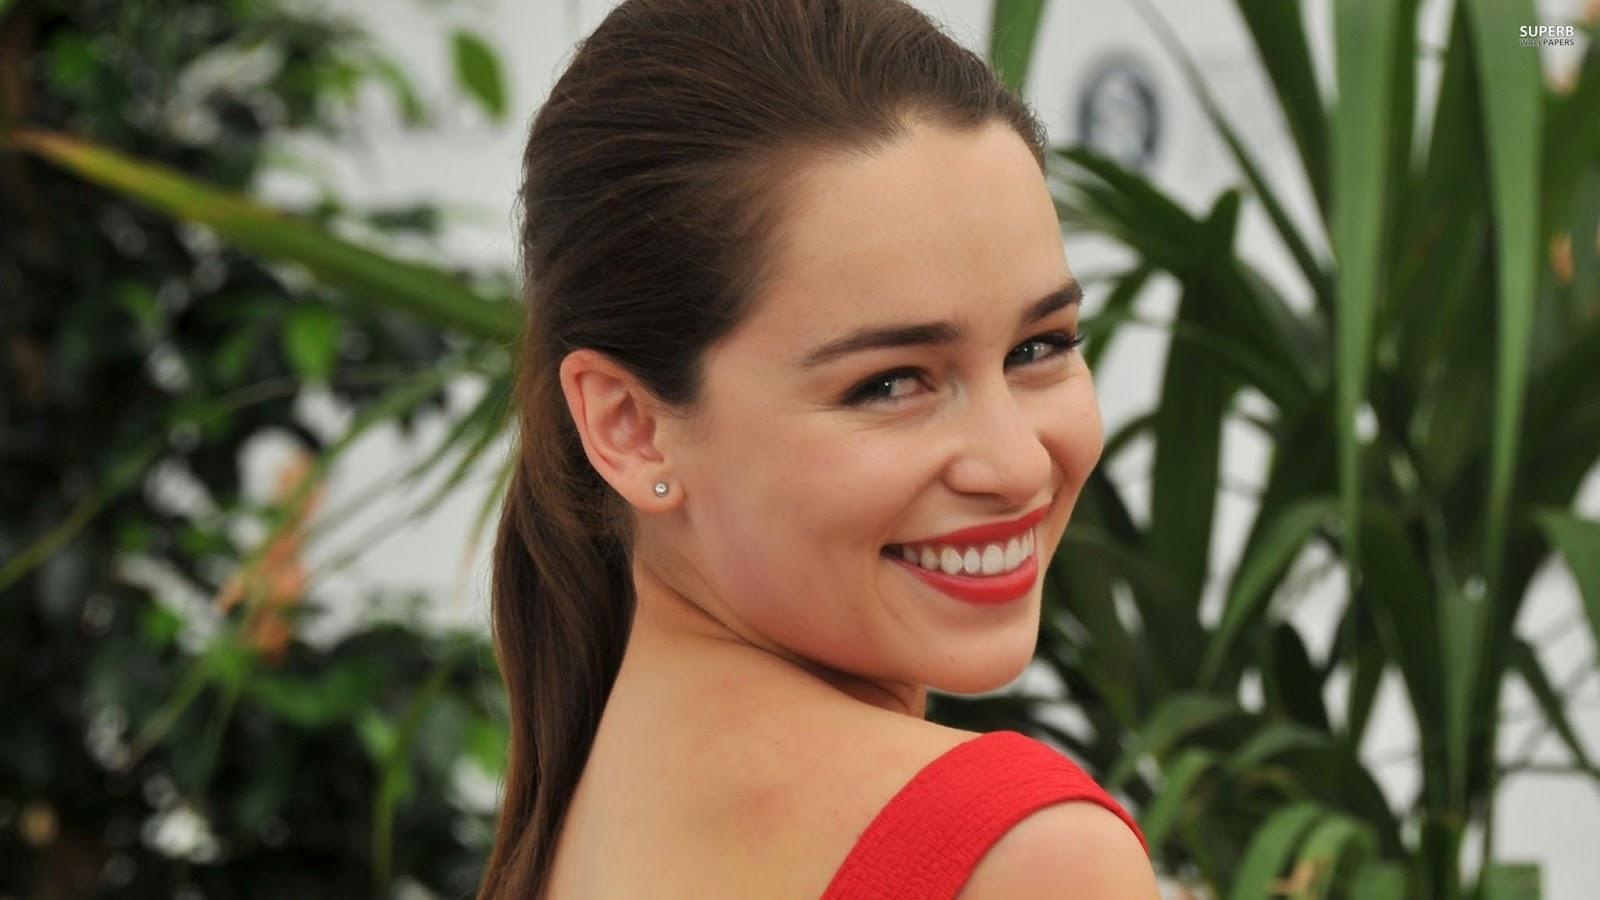 Hollywood actress Emilia clarke smile wallpaper